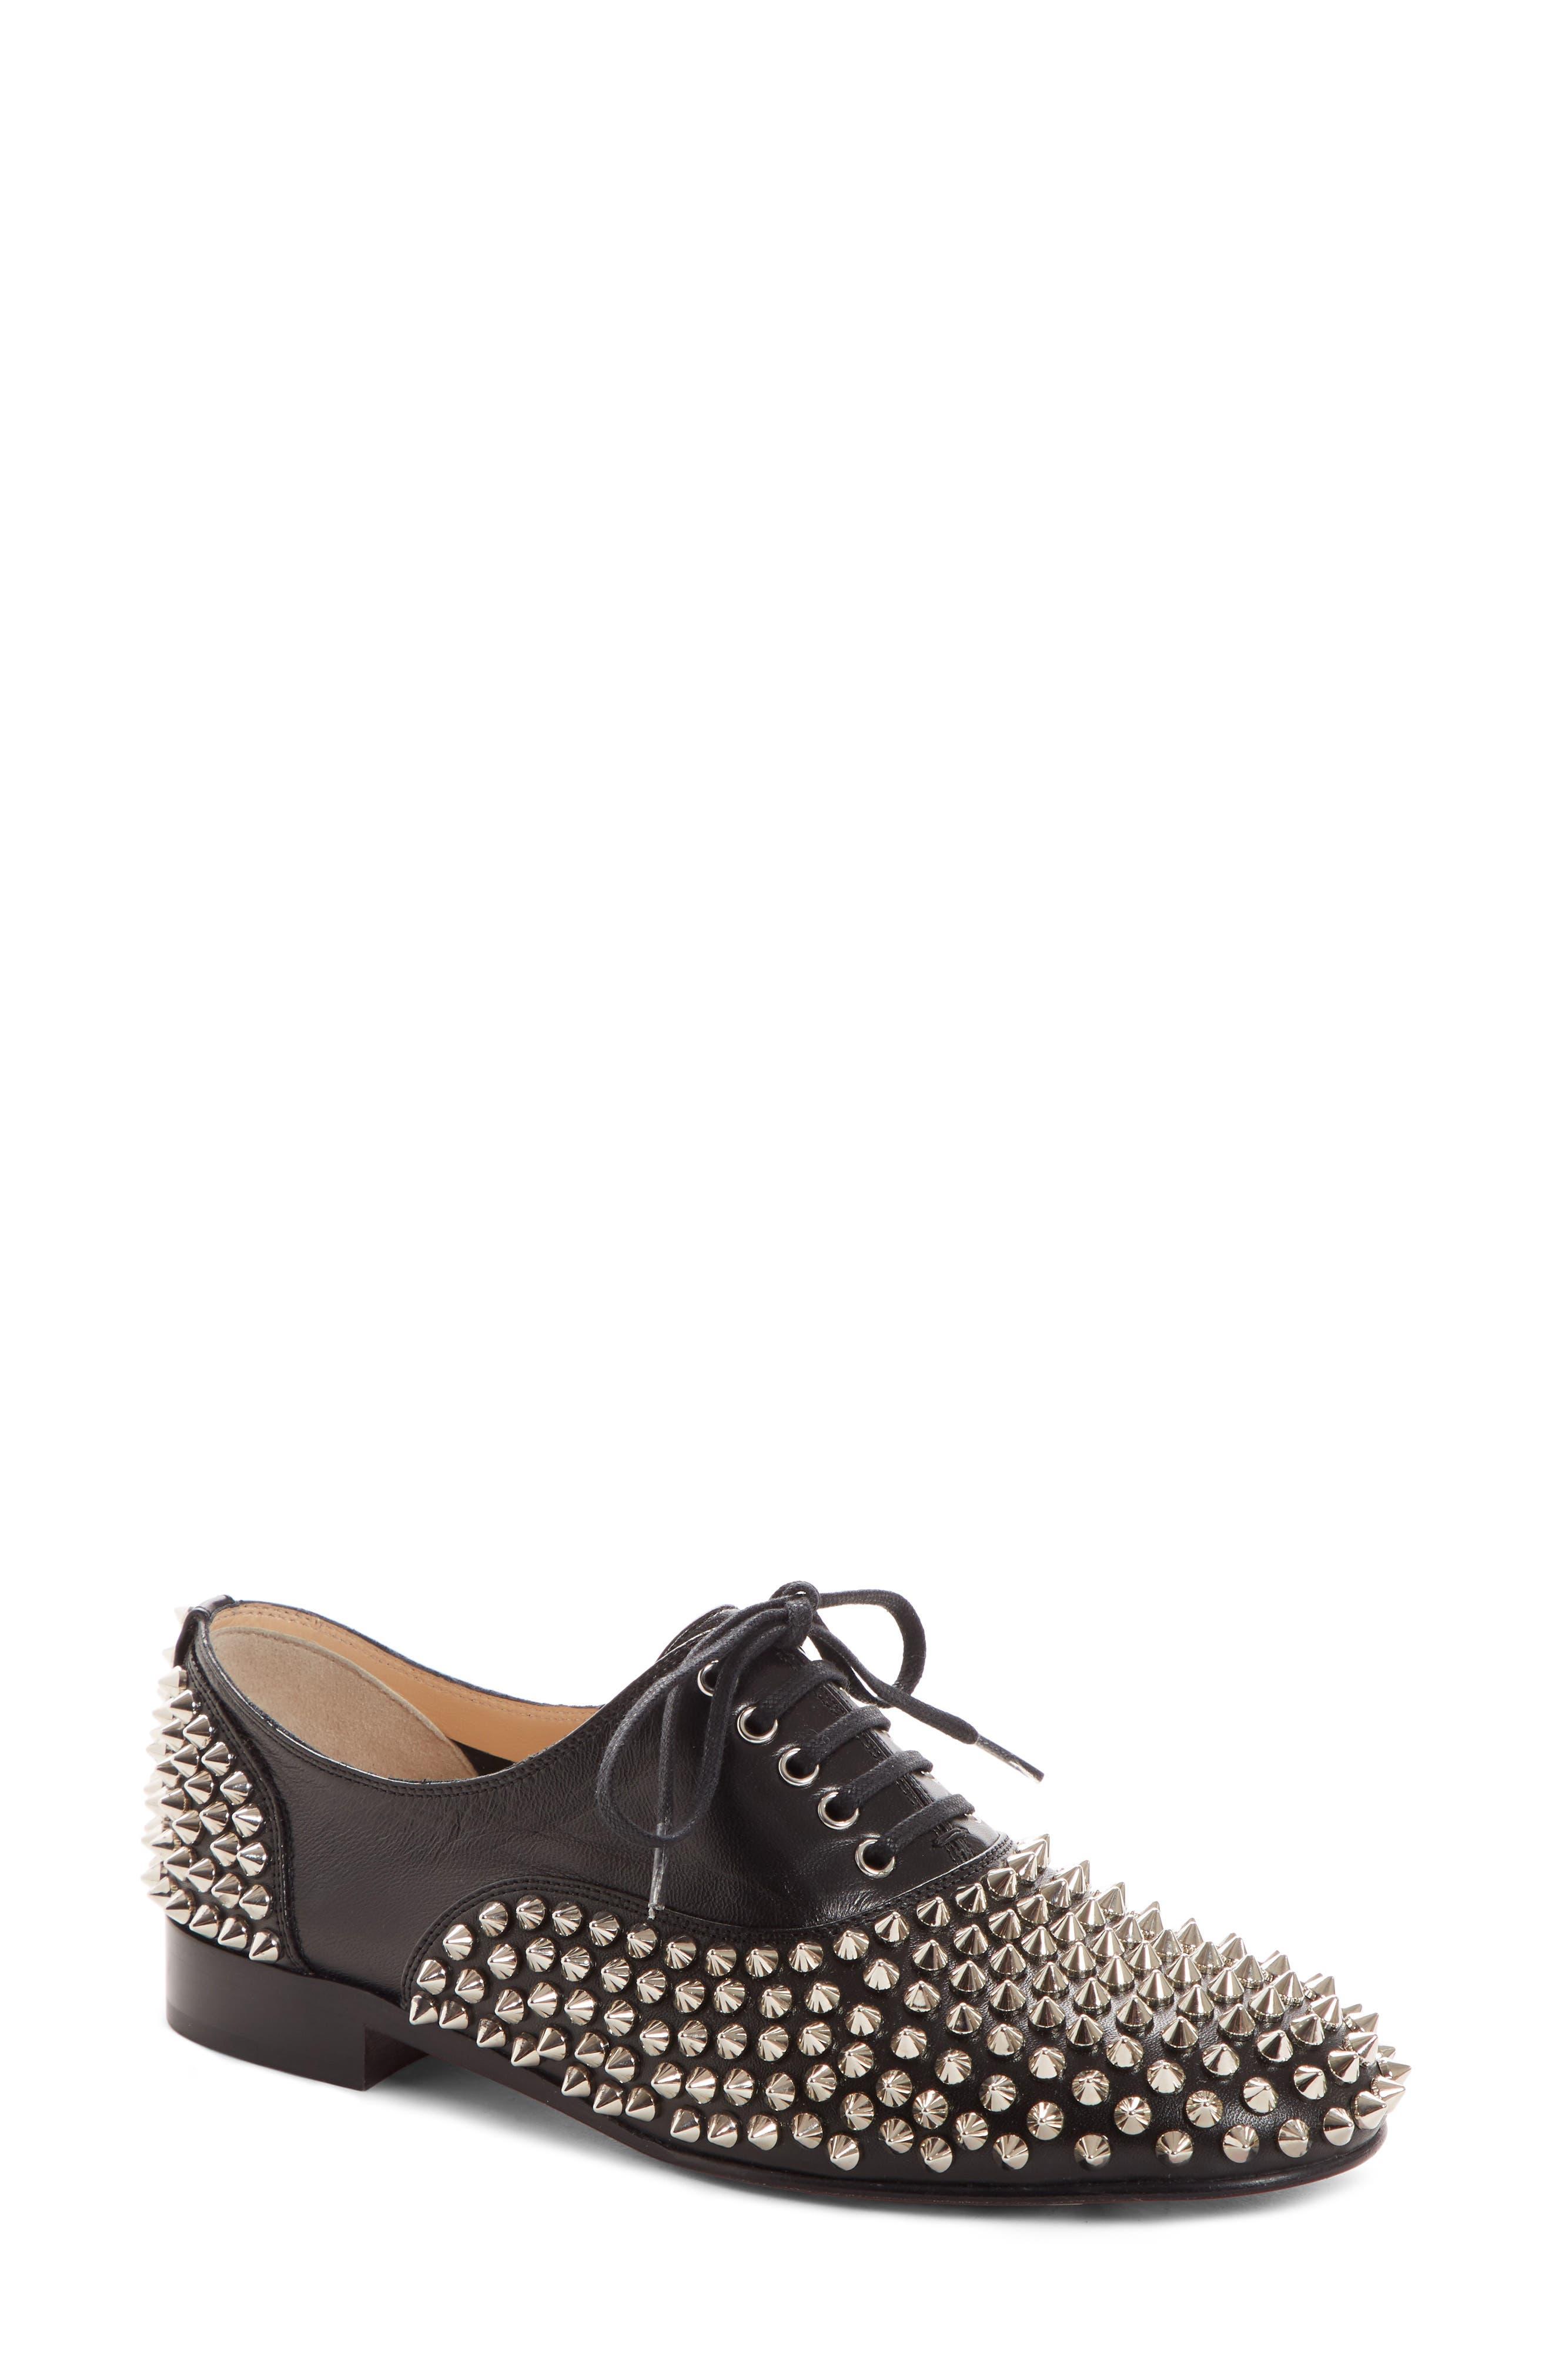 9a4f2d4dab03 Christian Louboutin Women s Flat Shoes